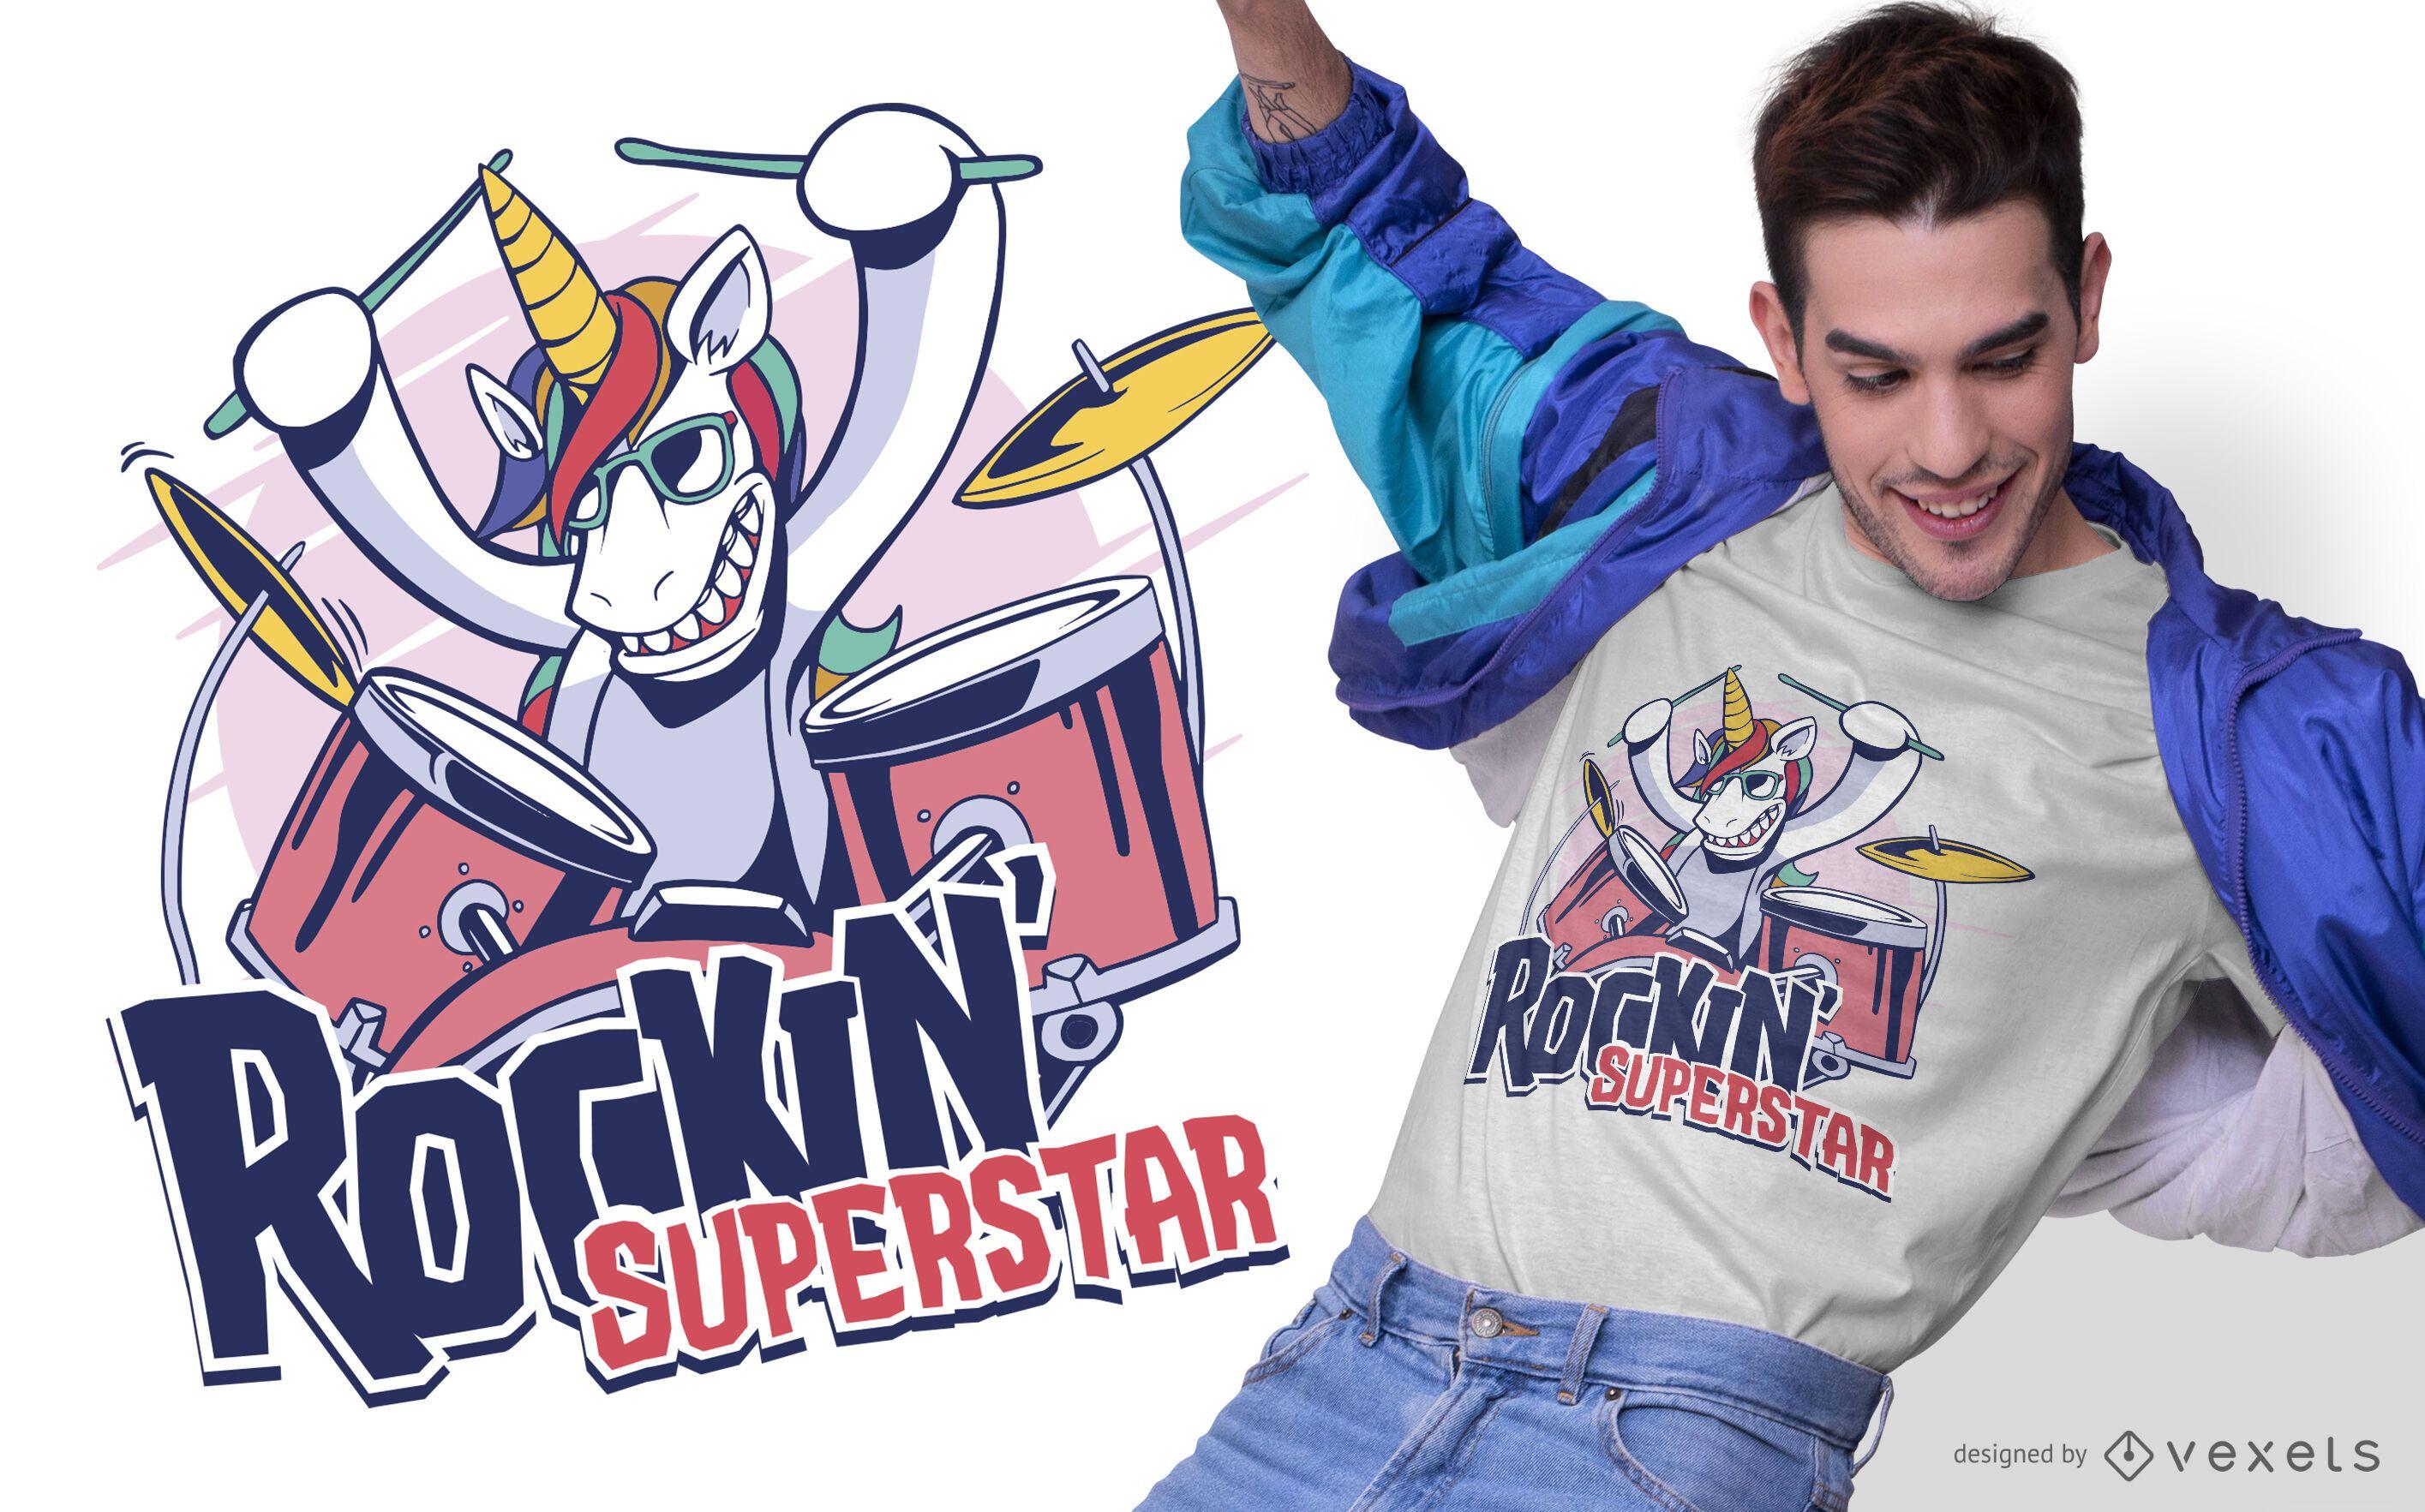 Diseño de camiseta unicornio superestrella